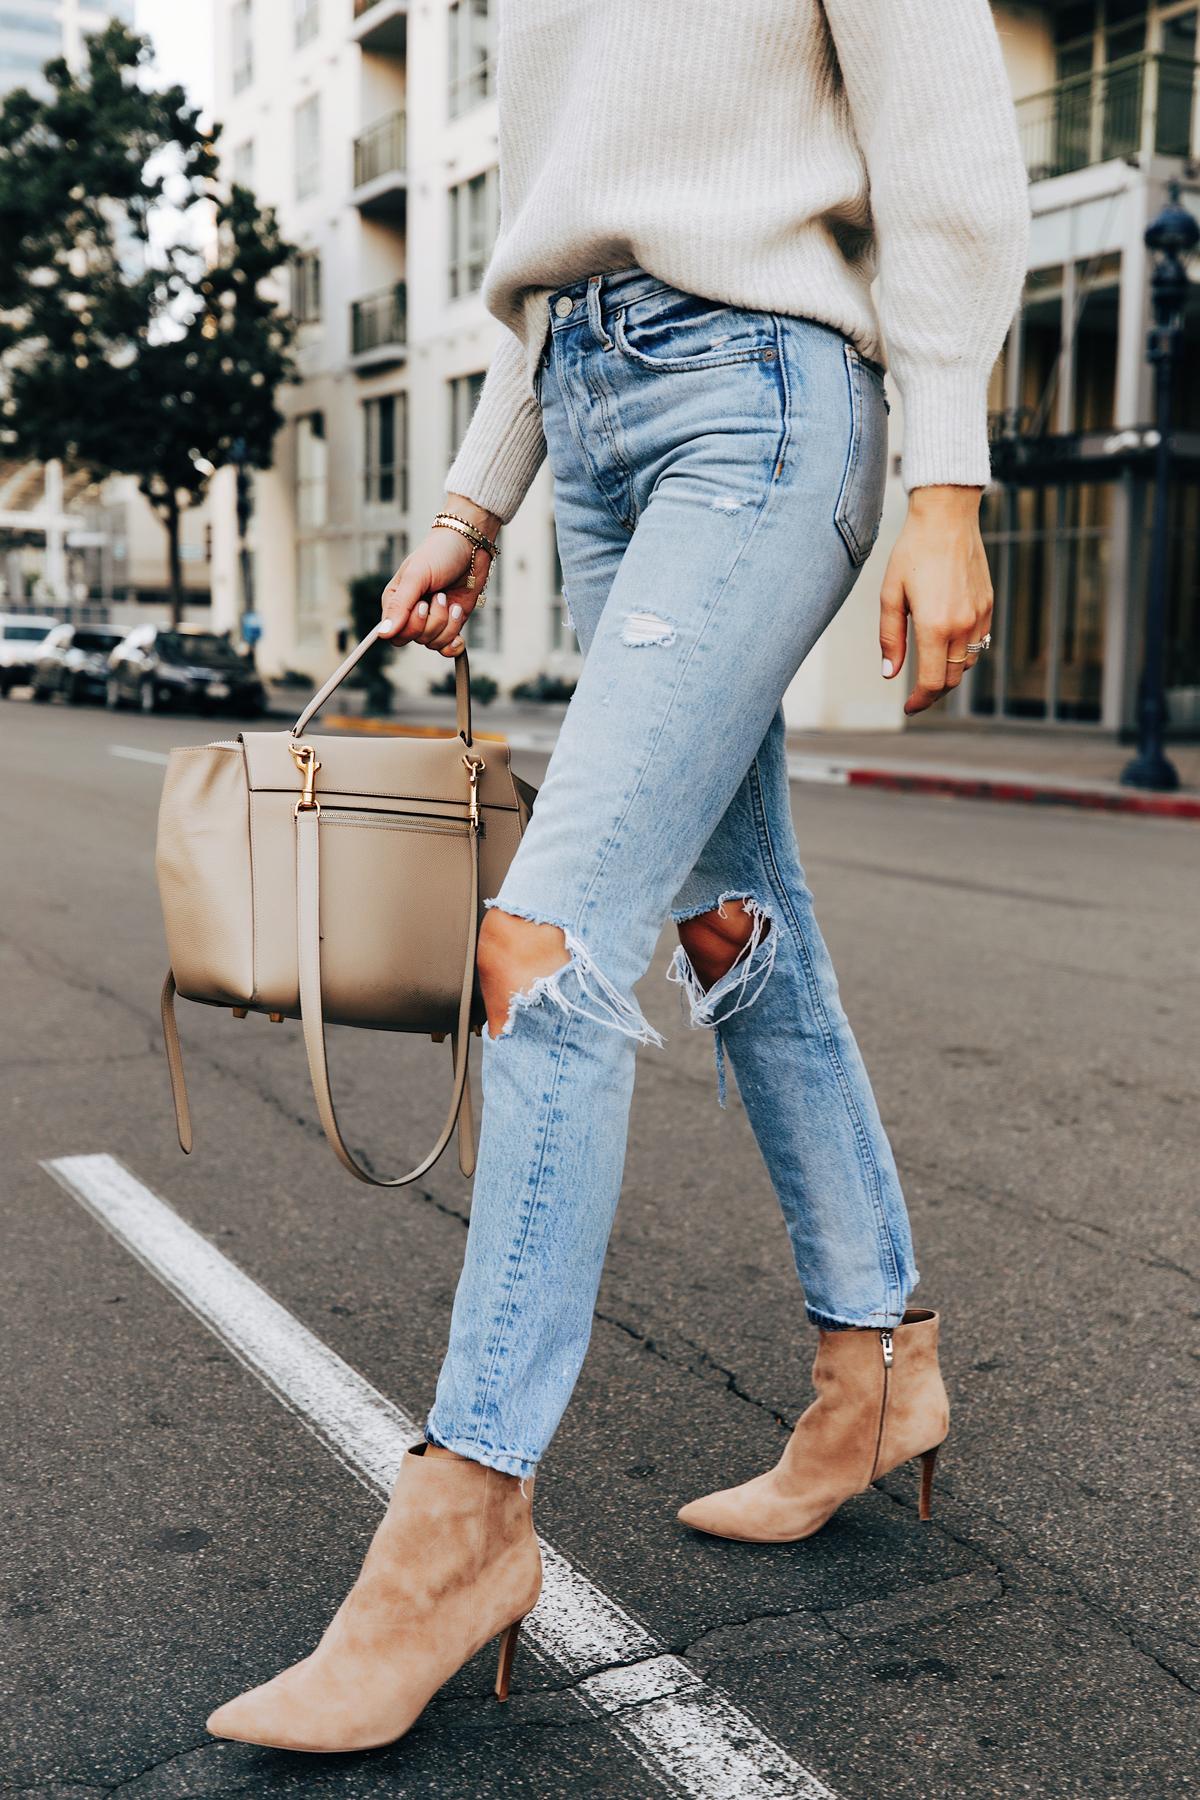 Fashion Jackson Wearing Beige Sweater Boyish Ripped Jeans Nine West Tan Suede Stiletto Booties